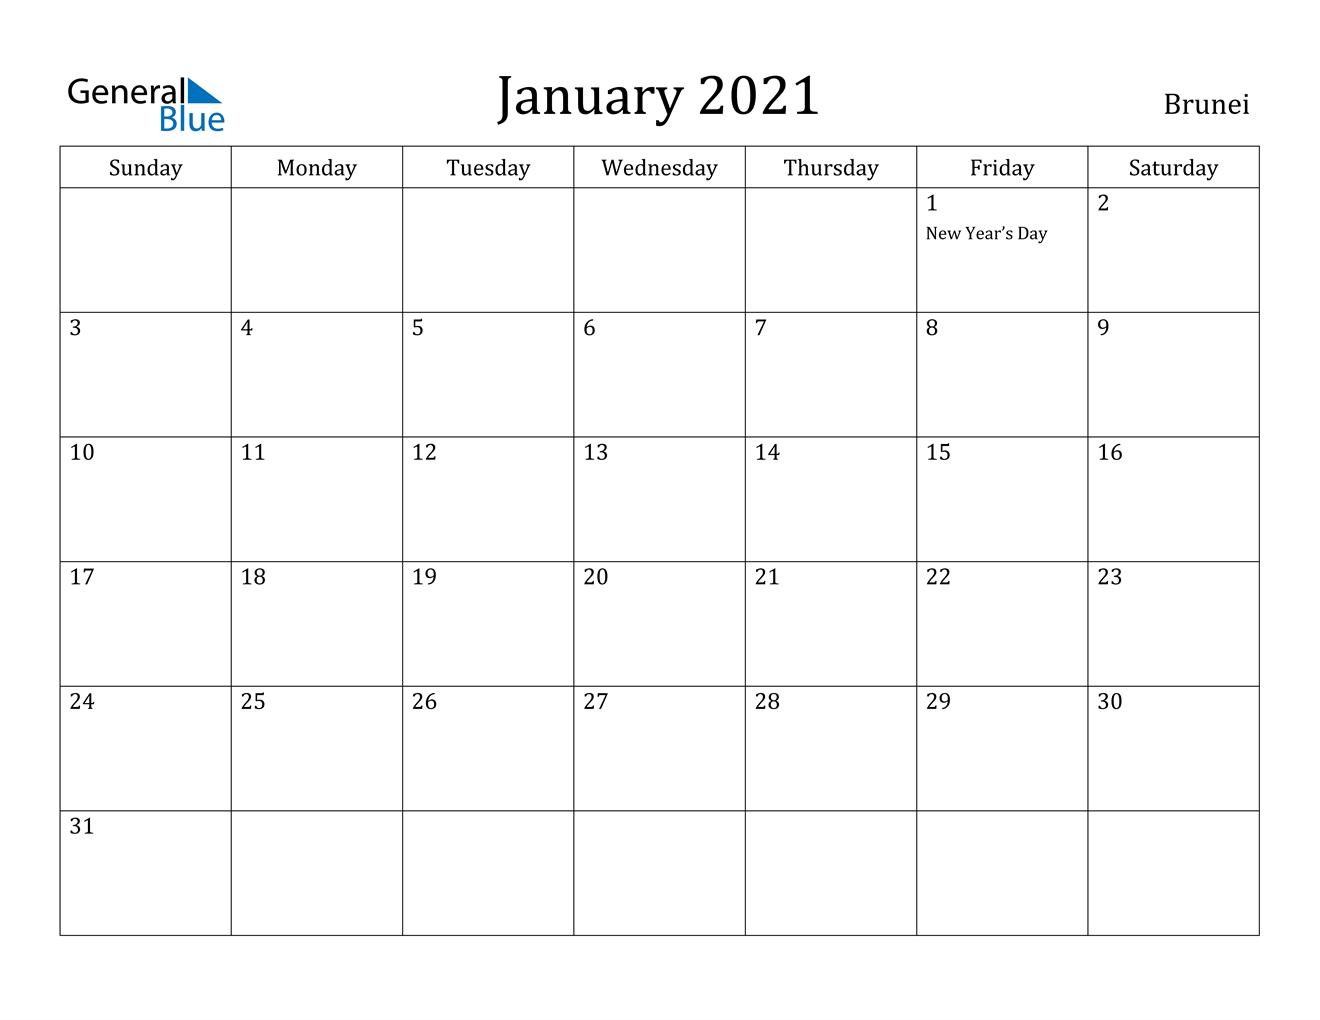 January 2021 Calendar - Brunei